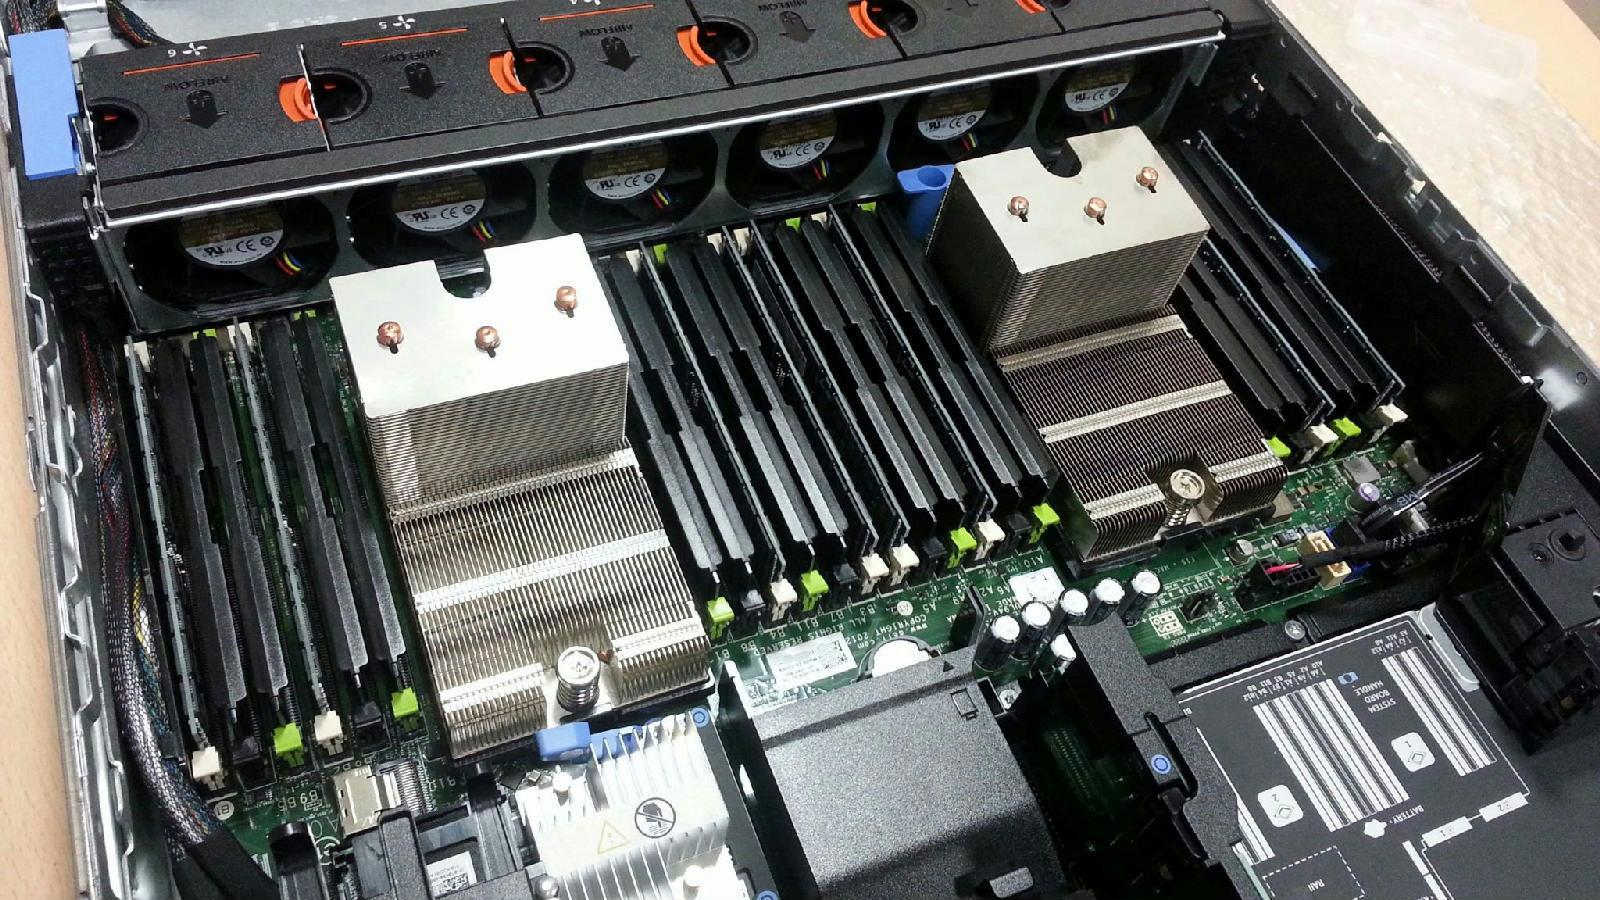 DELL PowerEdge R720 2xE5-2680 Xeon 8-Core 2 7GHz   128GB RAM   8x900GB SAS  RAID